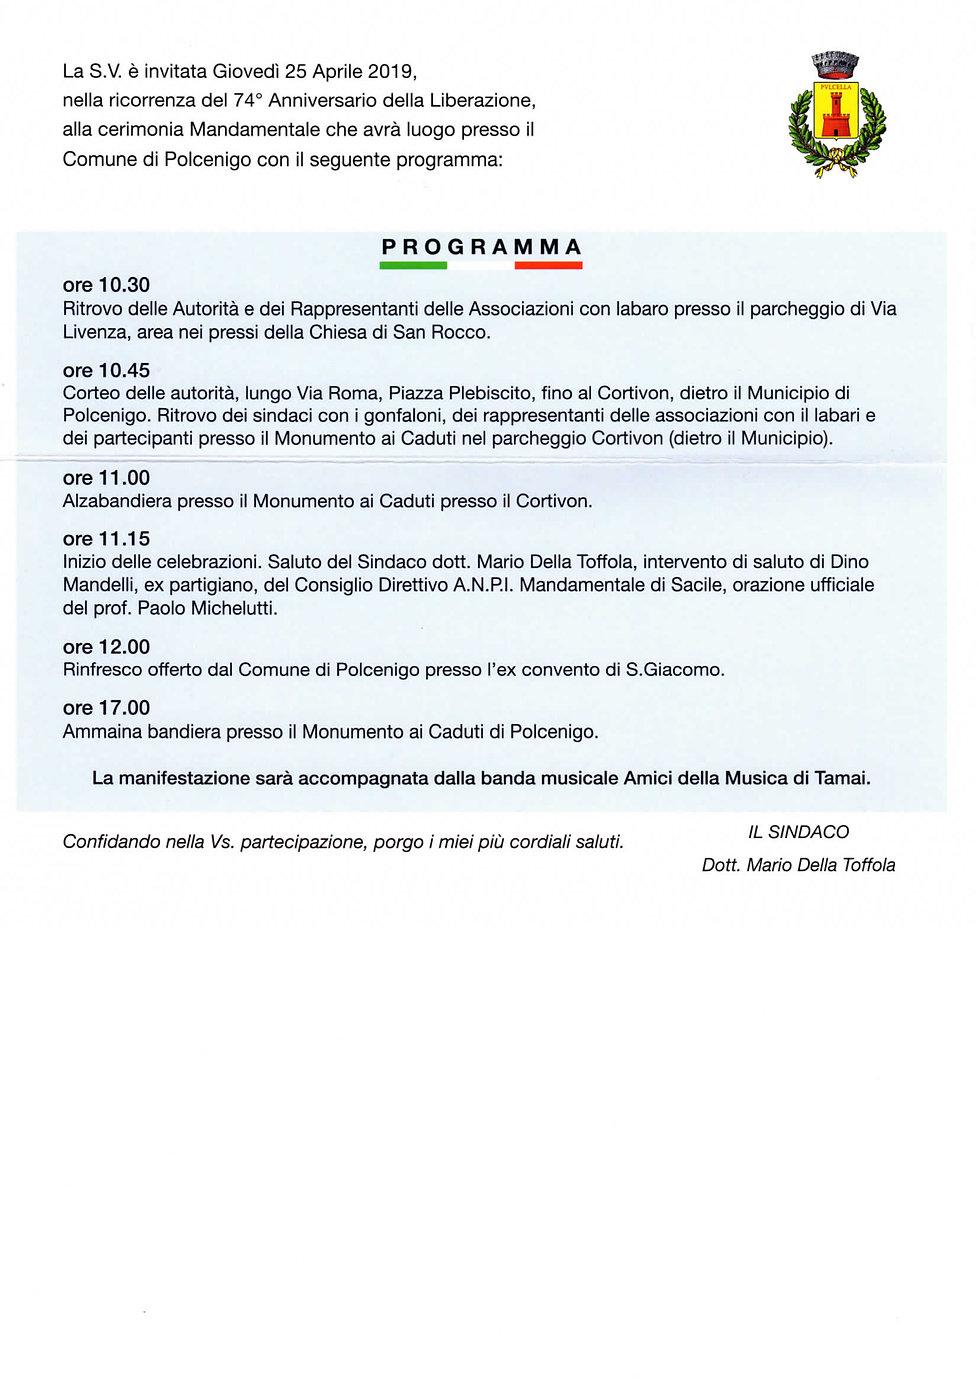 2 Fontanafredda invito.jpg